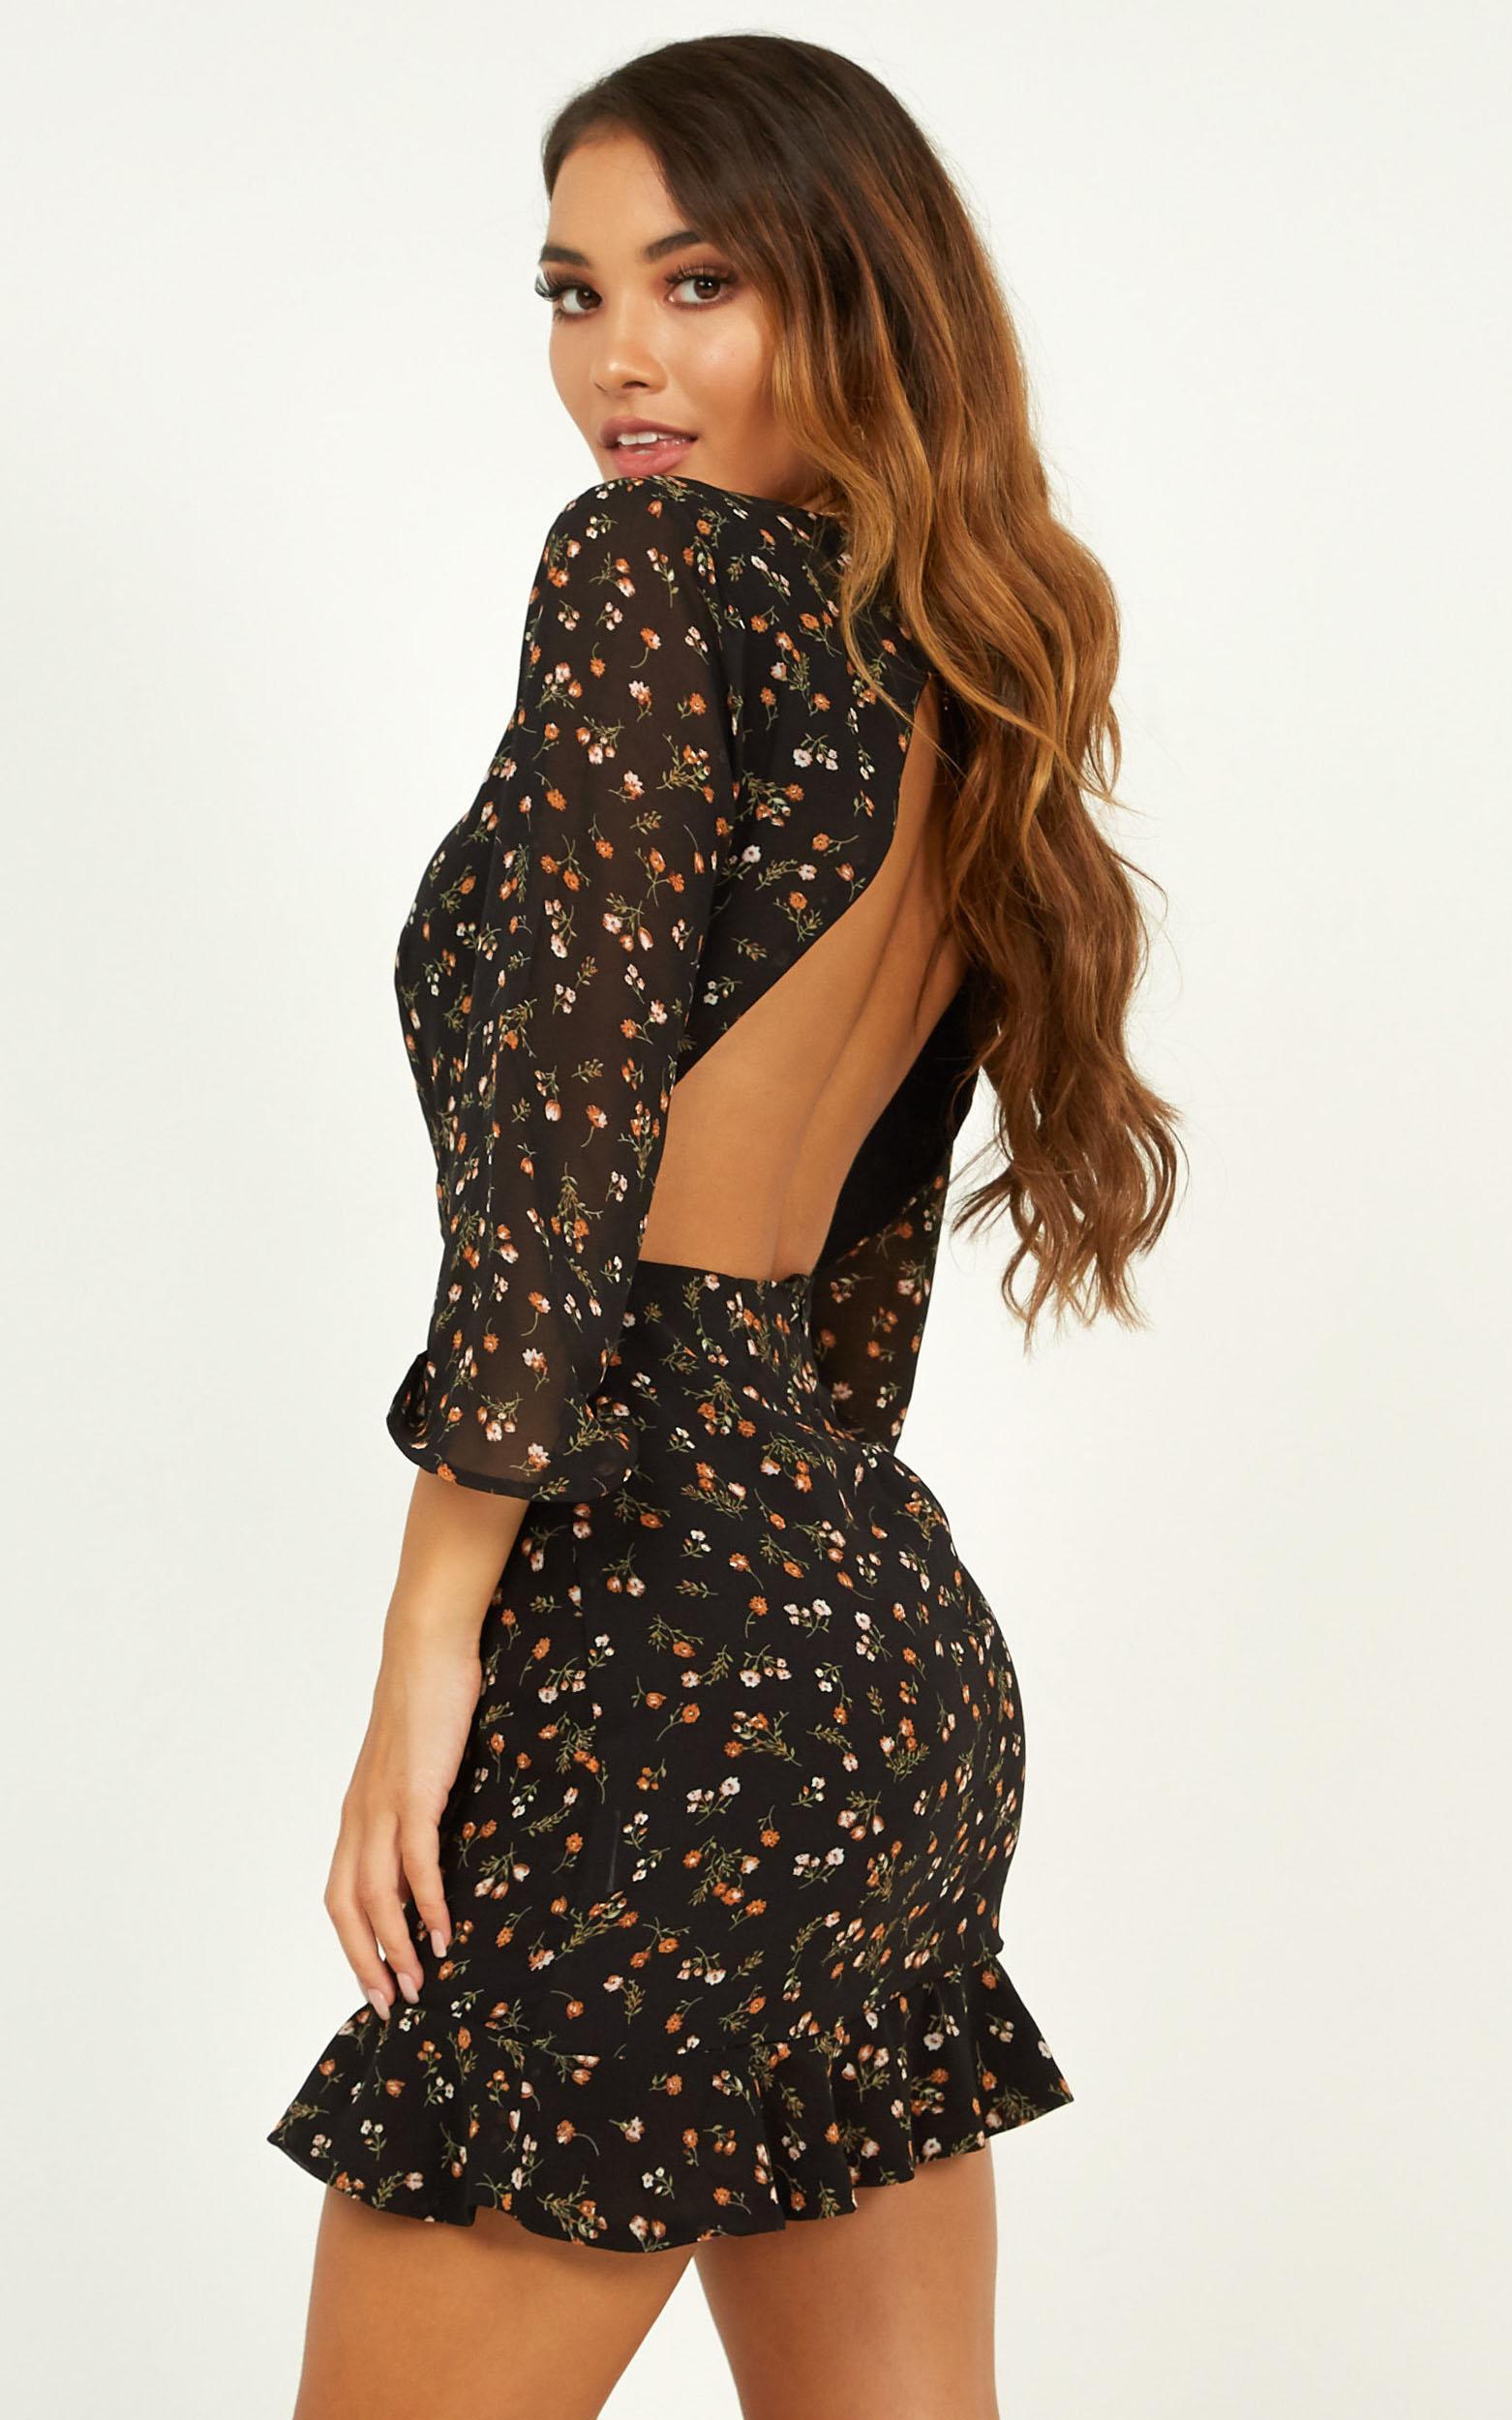 Baby You Got Me Dress In black floral - 20 (XXXXL), Black, hi-res image number null